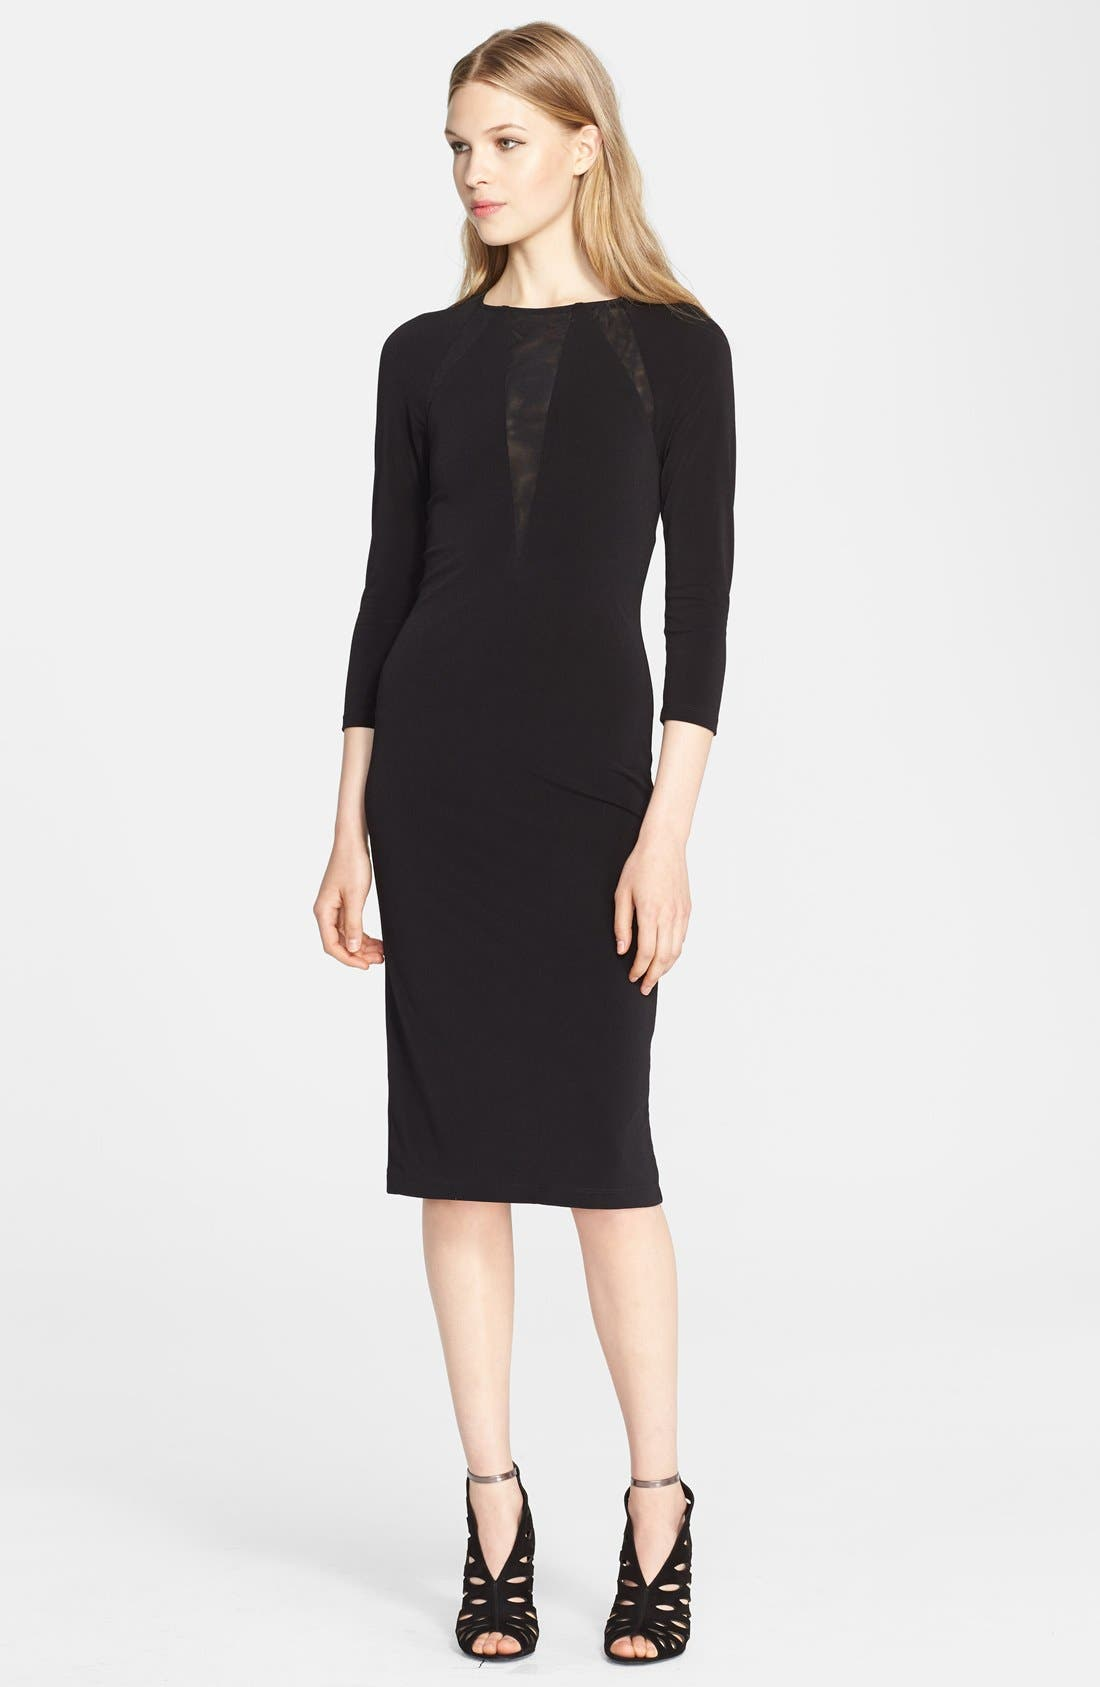 Main Image - Alice + Olivia 'Maris' Sheer Sunburst Jersey Dress